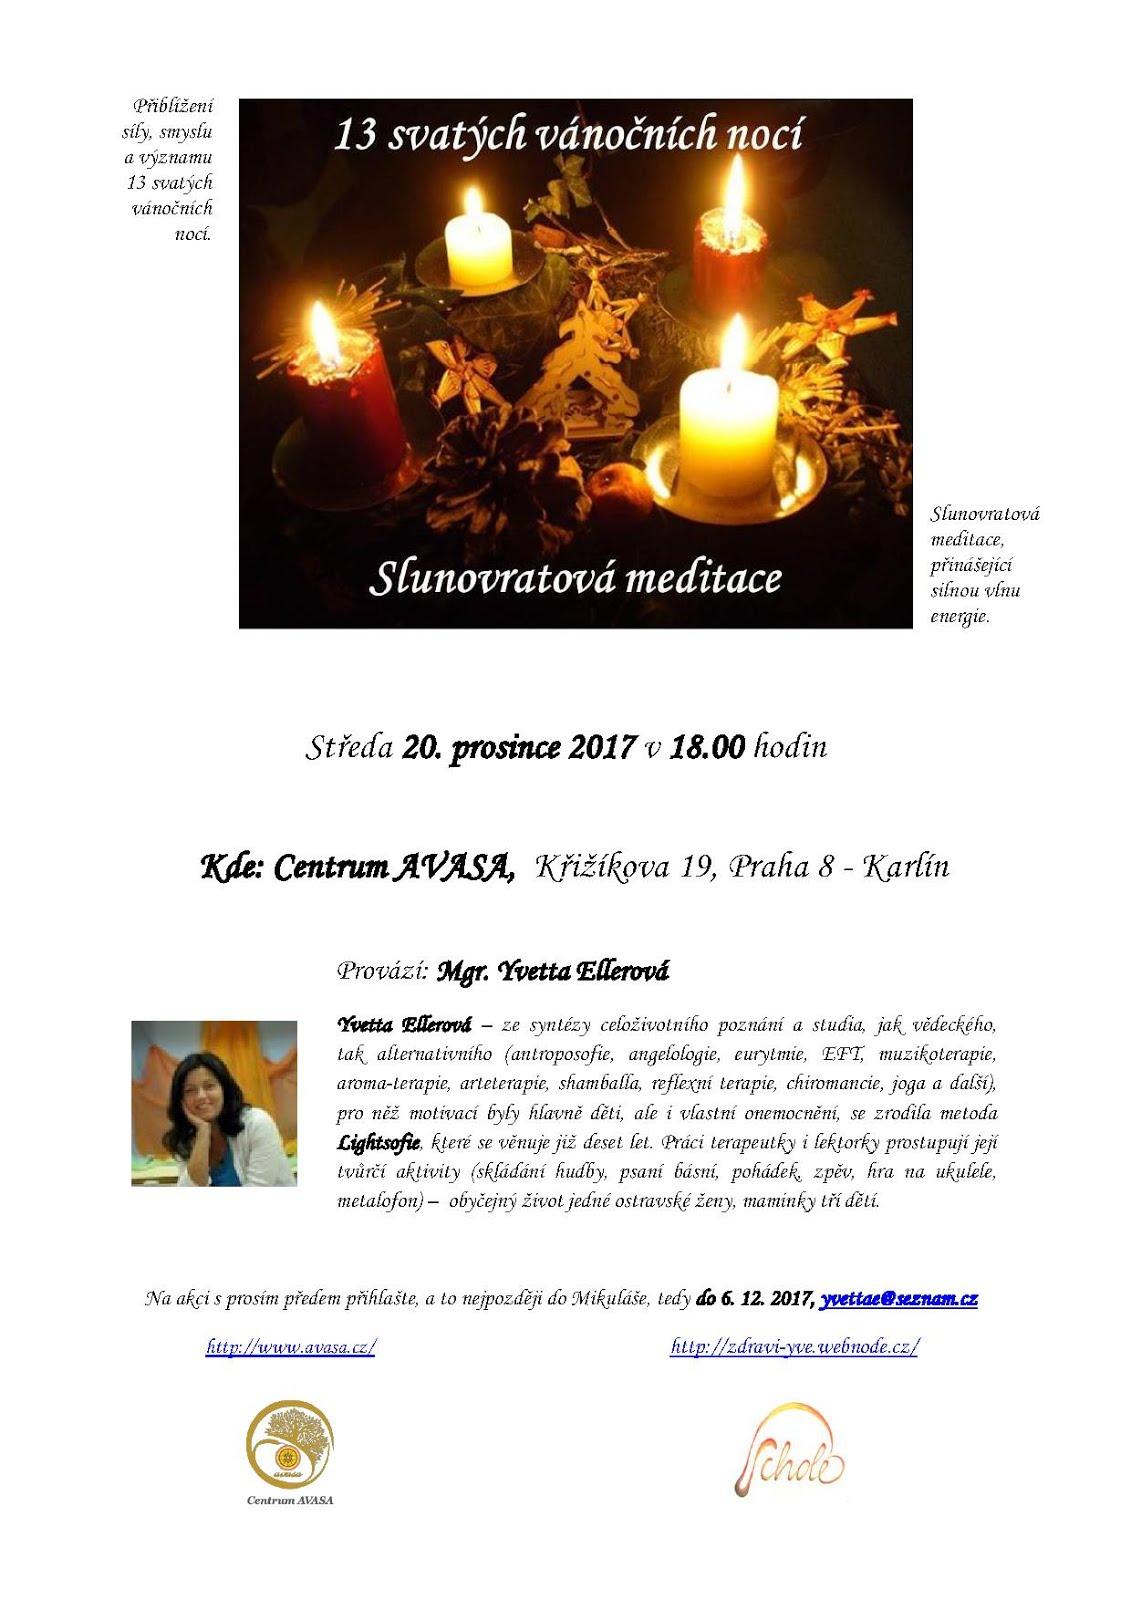 Slunovratová meditace v Praze - centrum AVASA